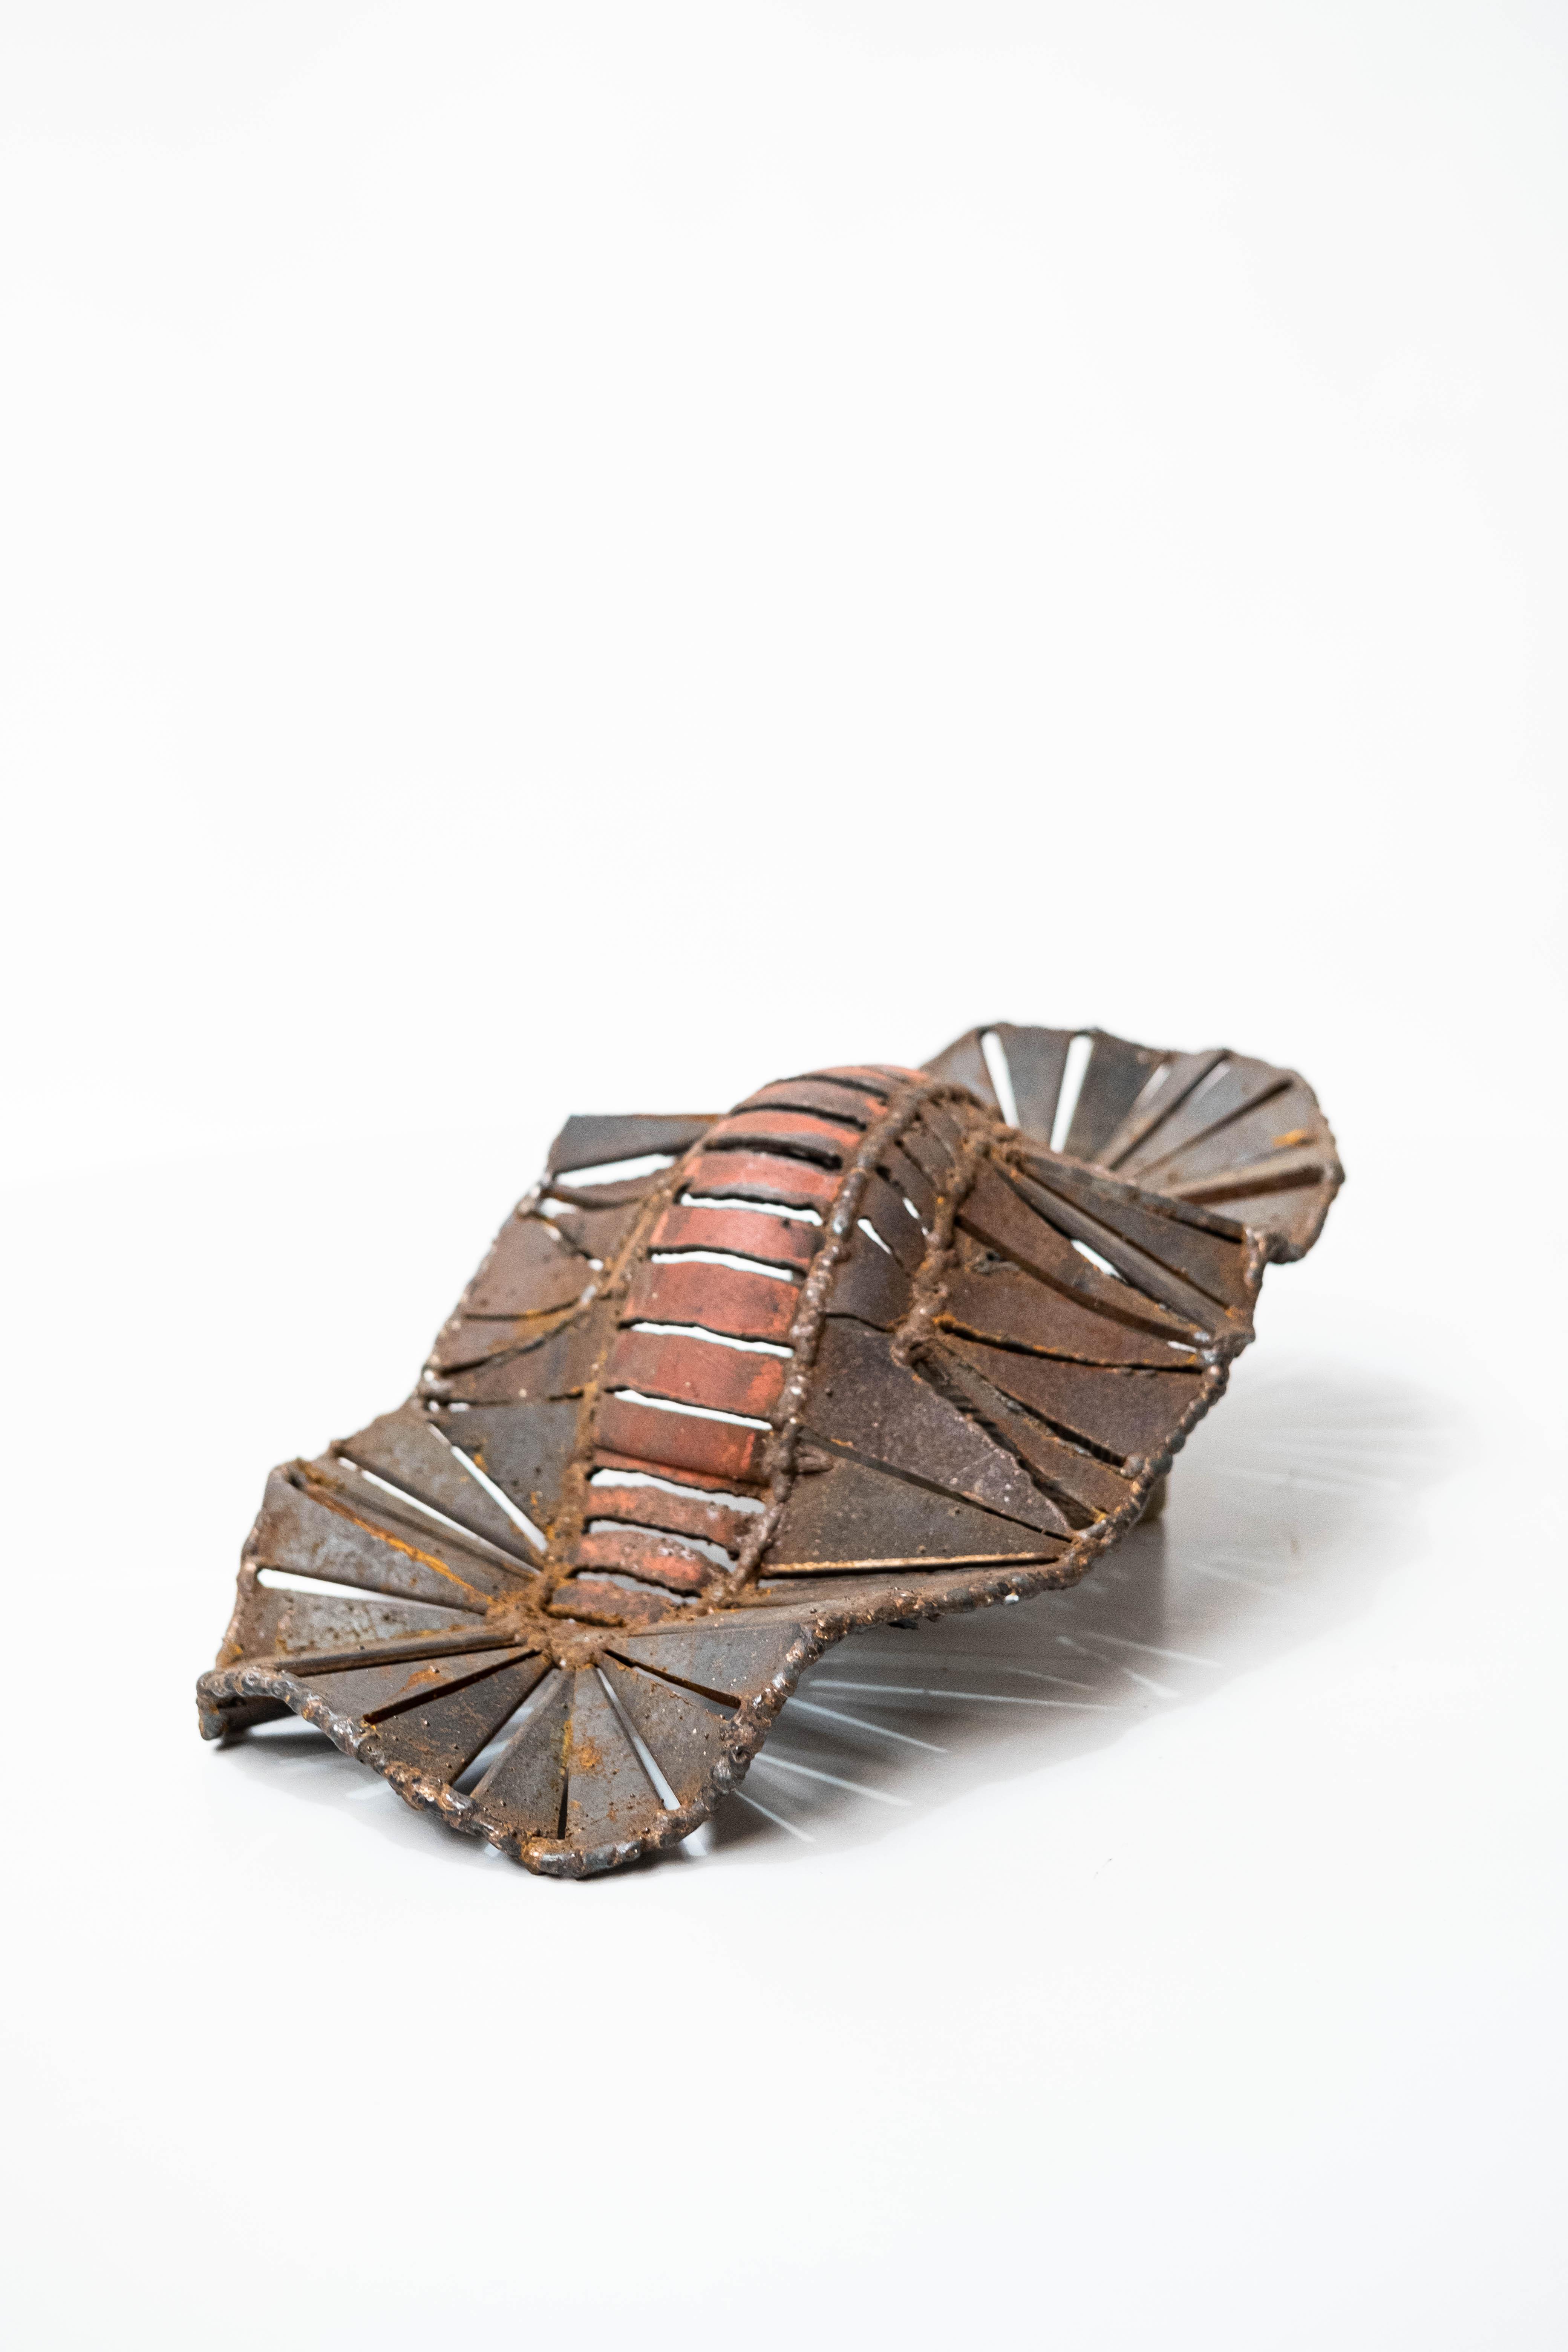 sculpture metal outdoor sea snail marisja smit art